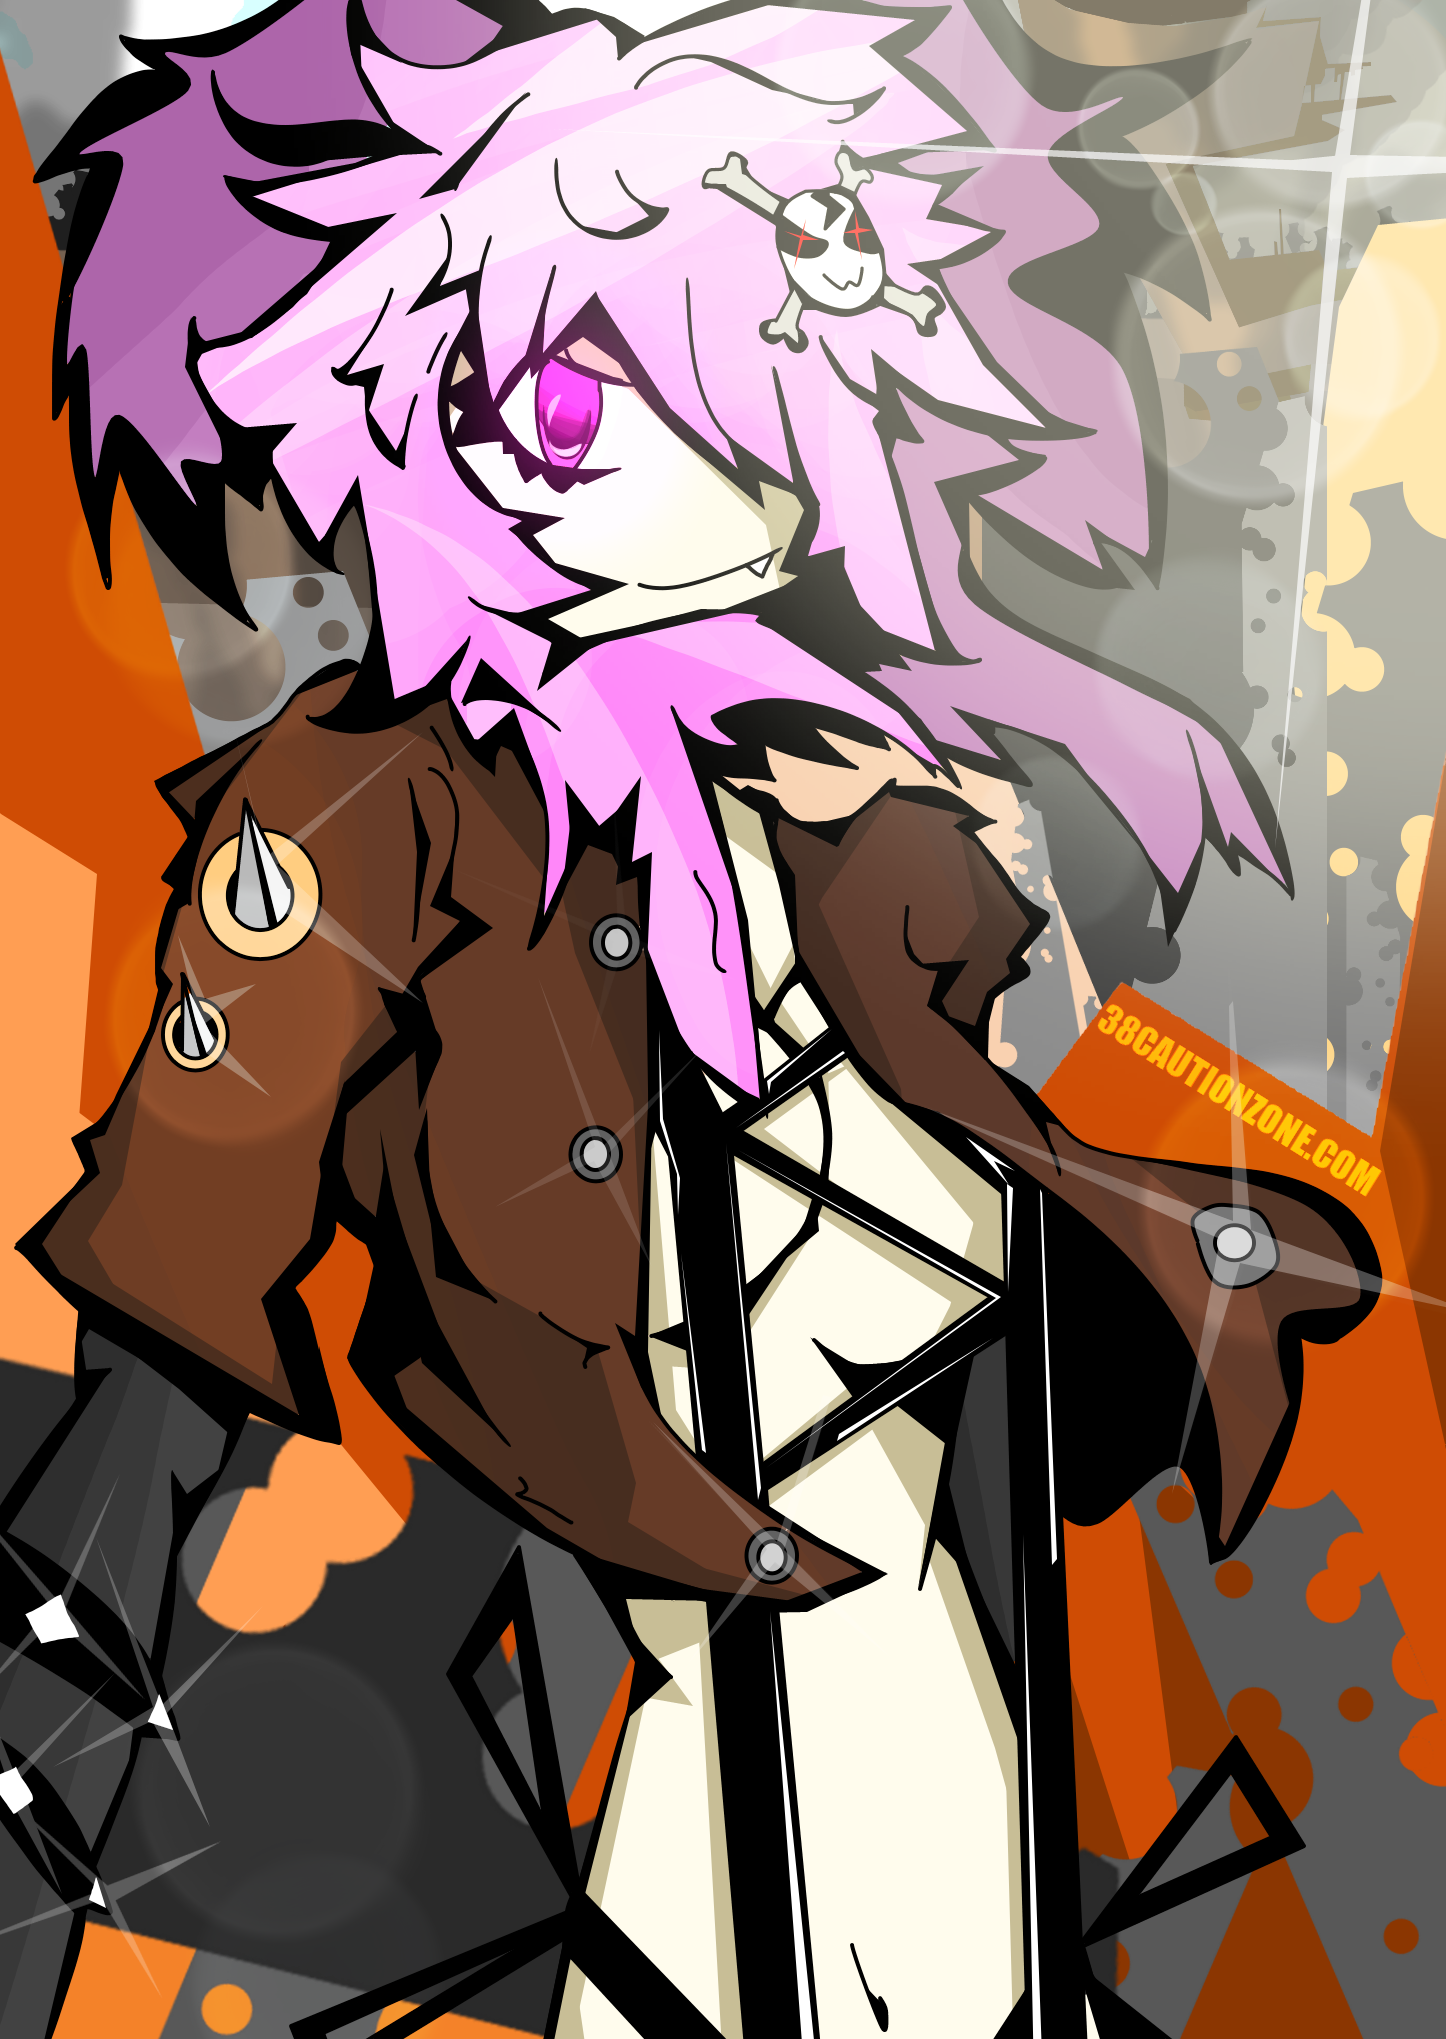 Saiko the Wastelander